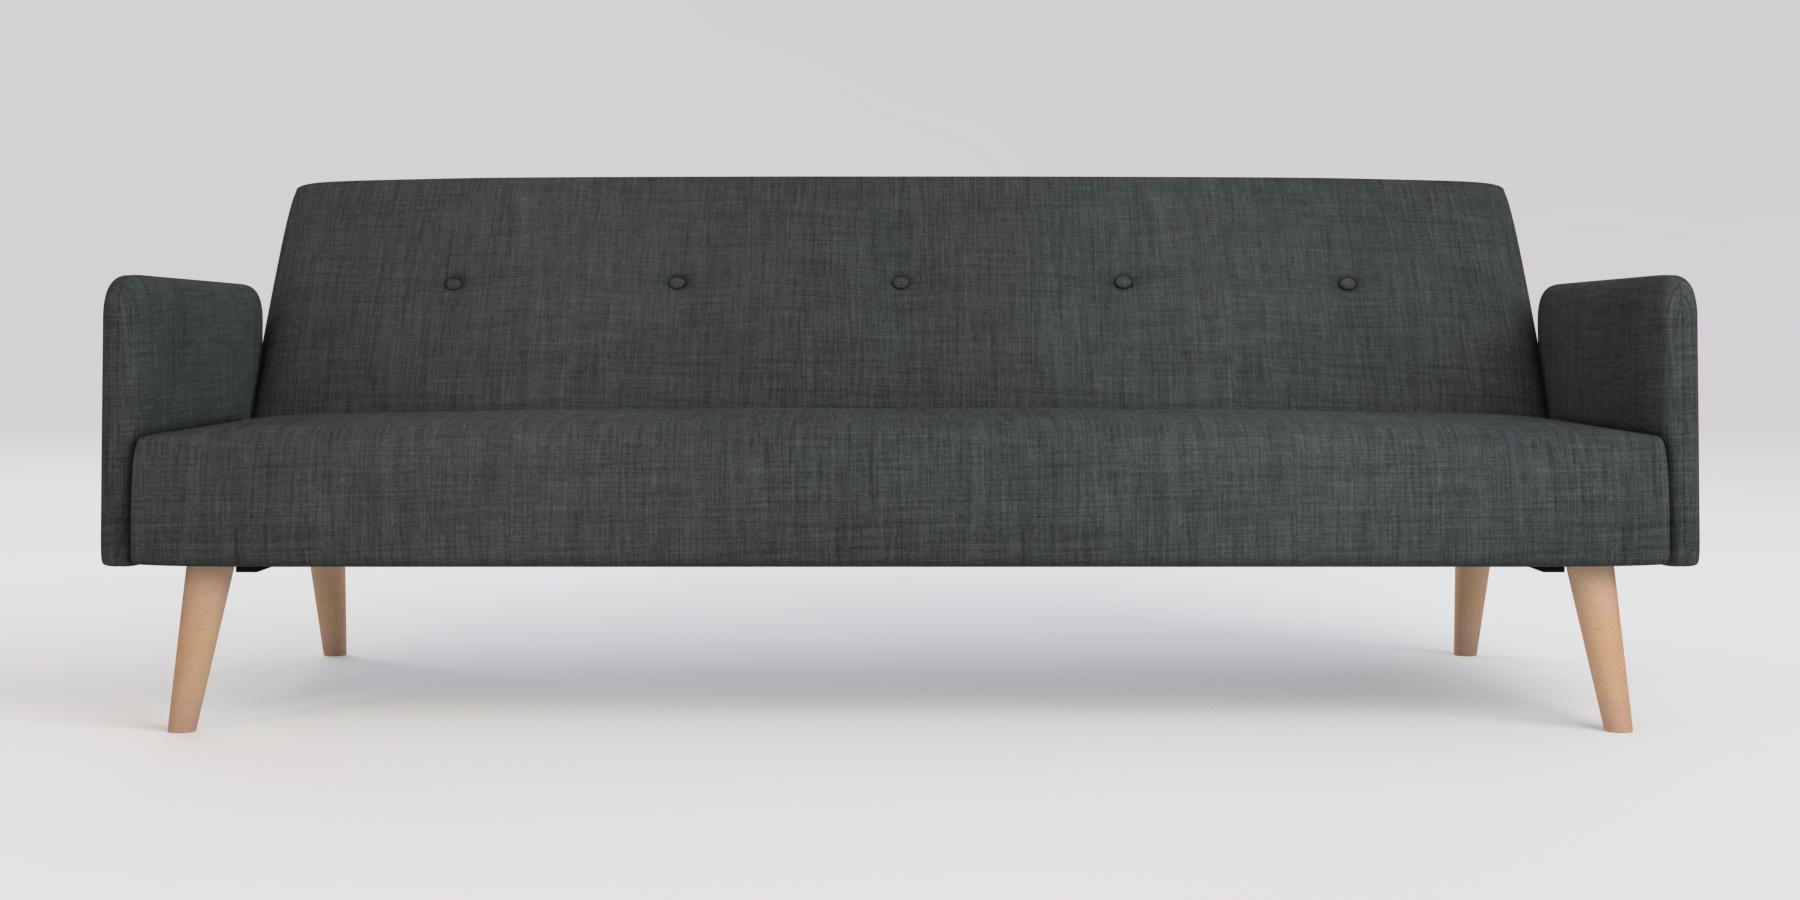 Next Brompton Leather Sofa River Plate Uru Ca Boston Sofascore Beds | Brokeasshome.com